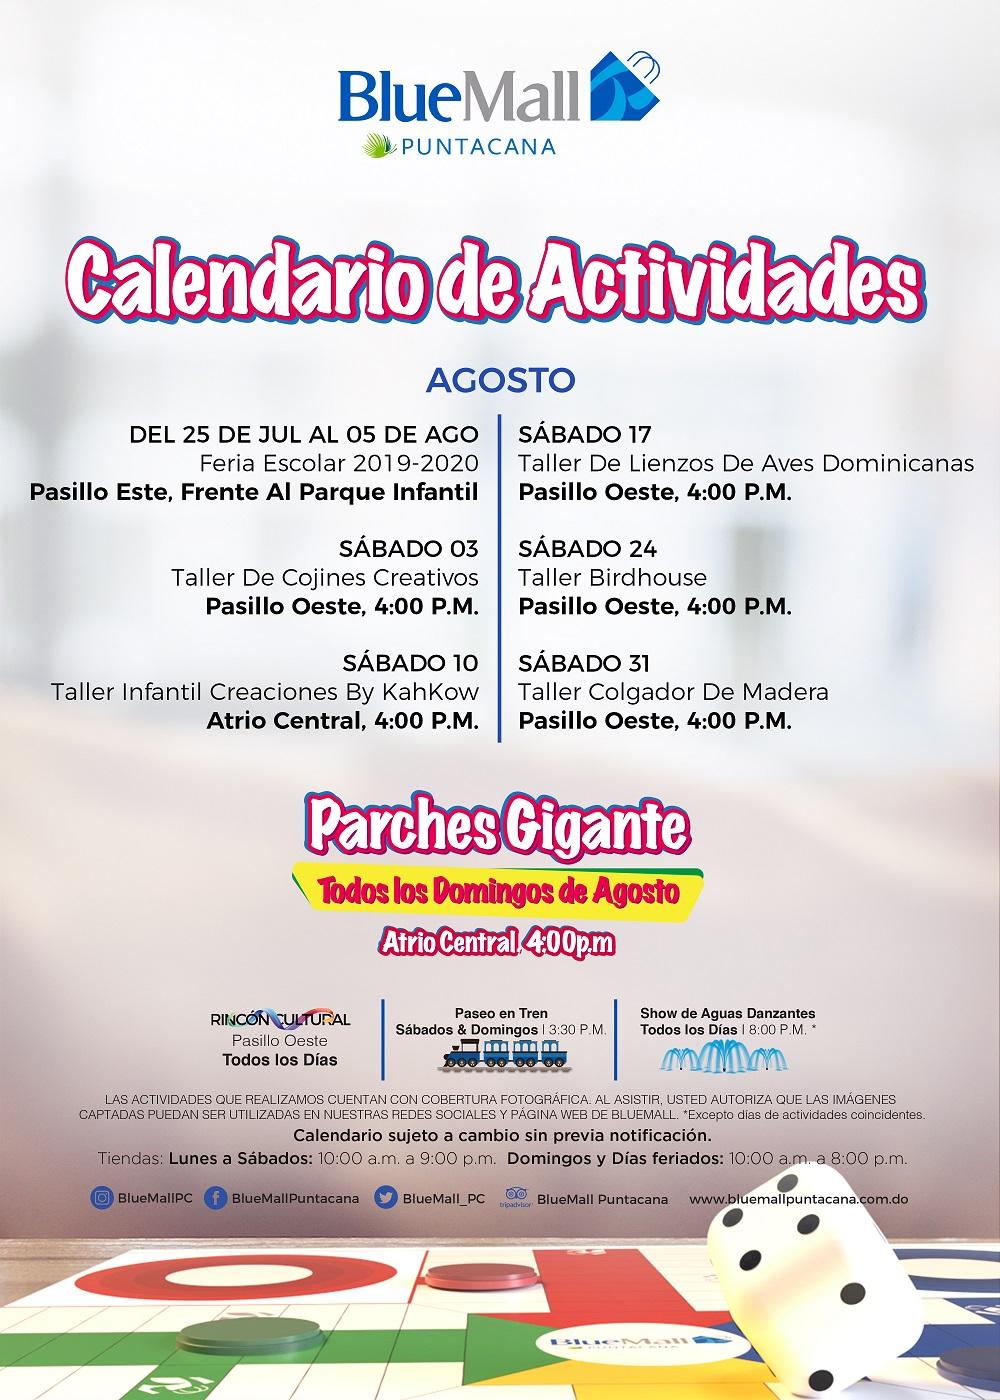 Calendario F.Puntacana Resort Club Is Home To The Caribbean S Ultimate